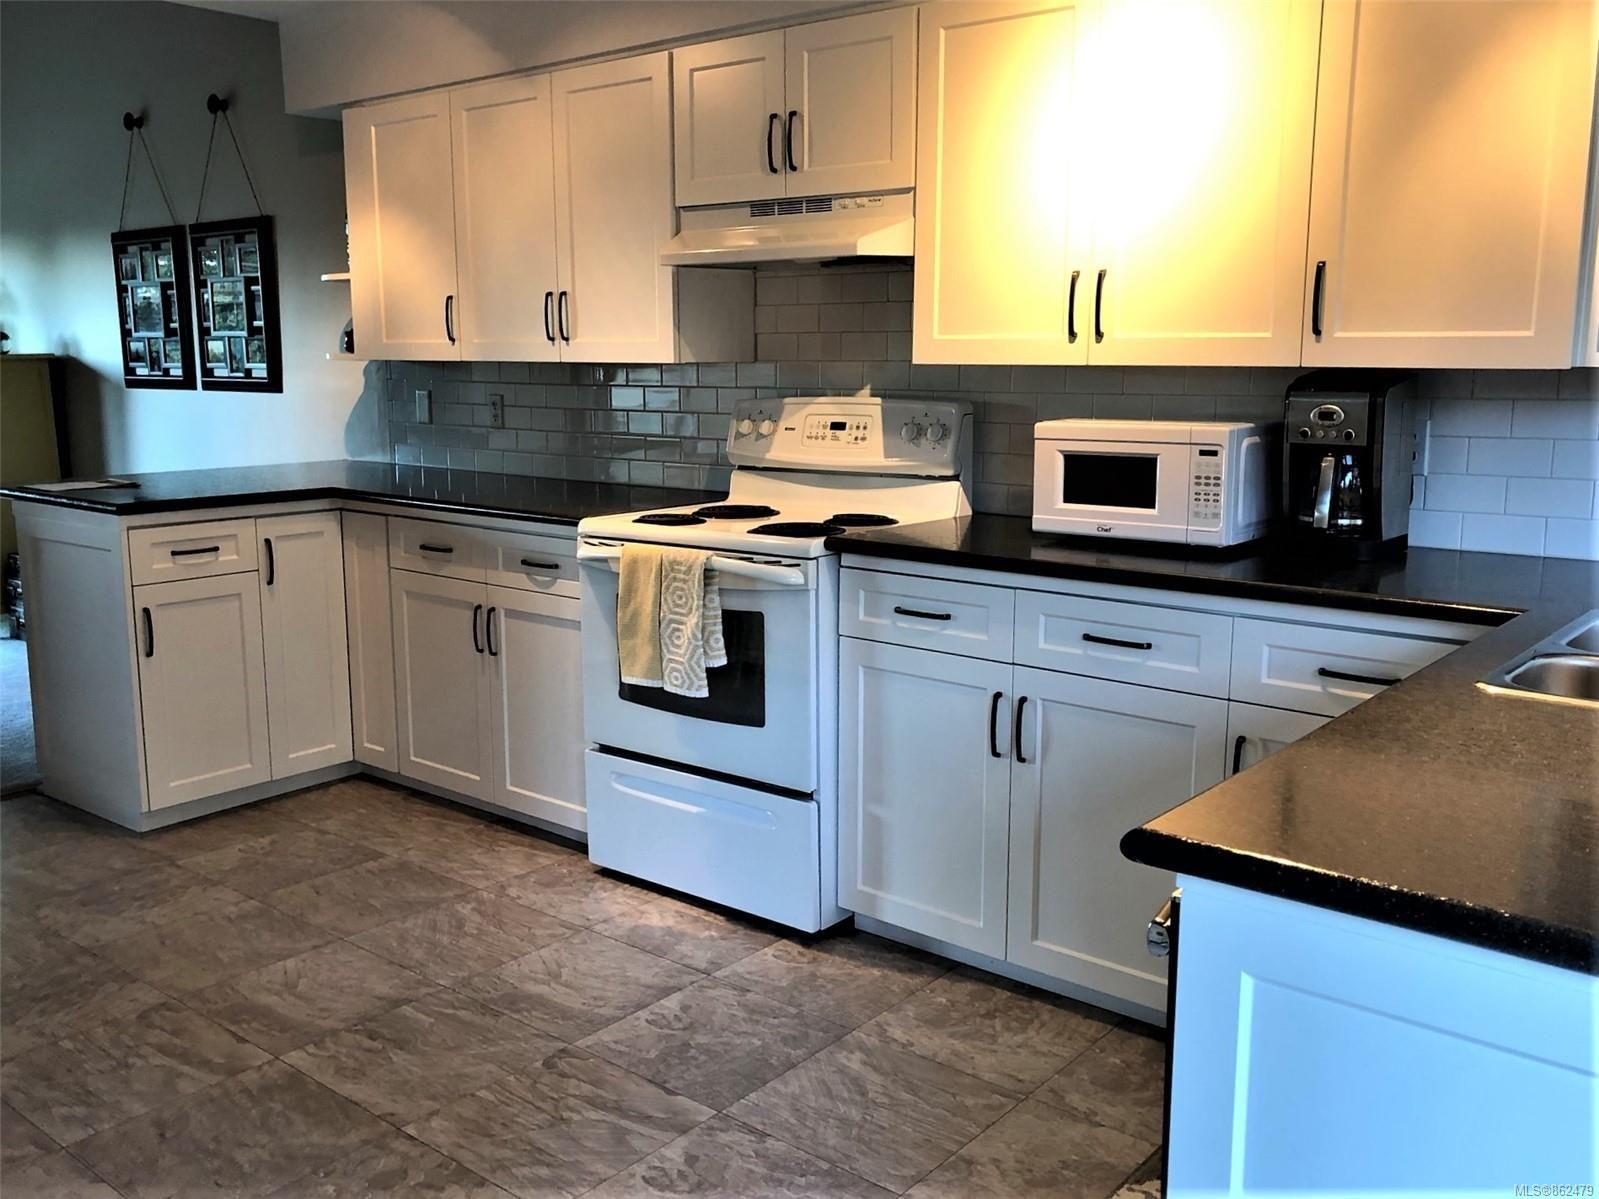 Photo 17: Photos: 6 570 W CRESCENT Rd in : PQ Qualicum Beach Row/Townhouse for sale (Parksville/Qualicum)  : MLS®# 862479